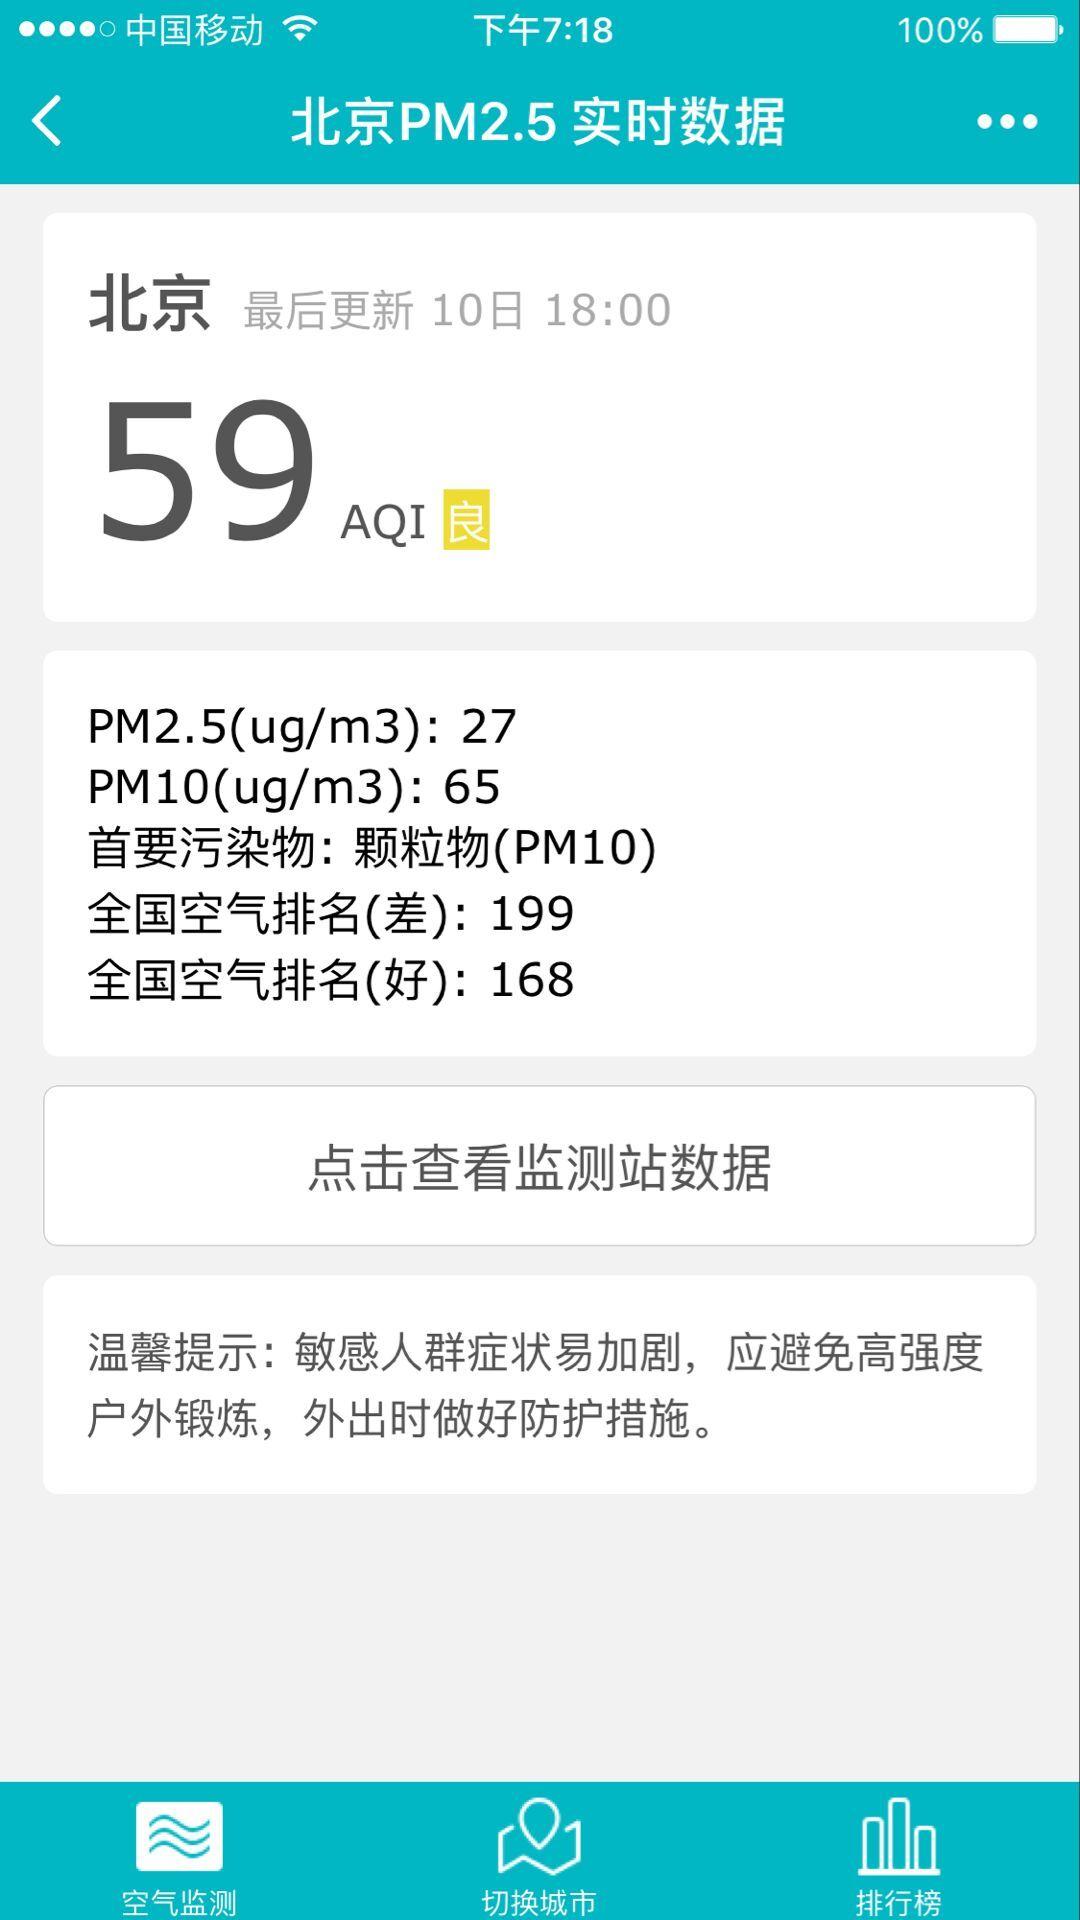 Pm2.5指数查询小程序